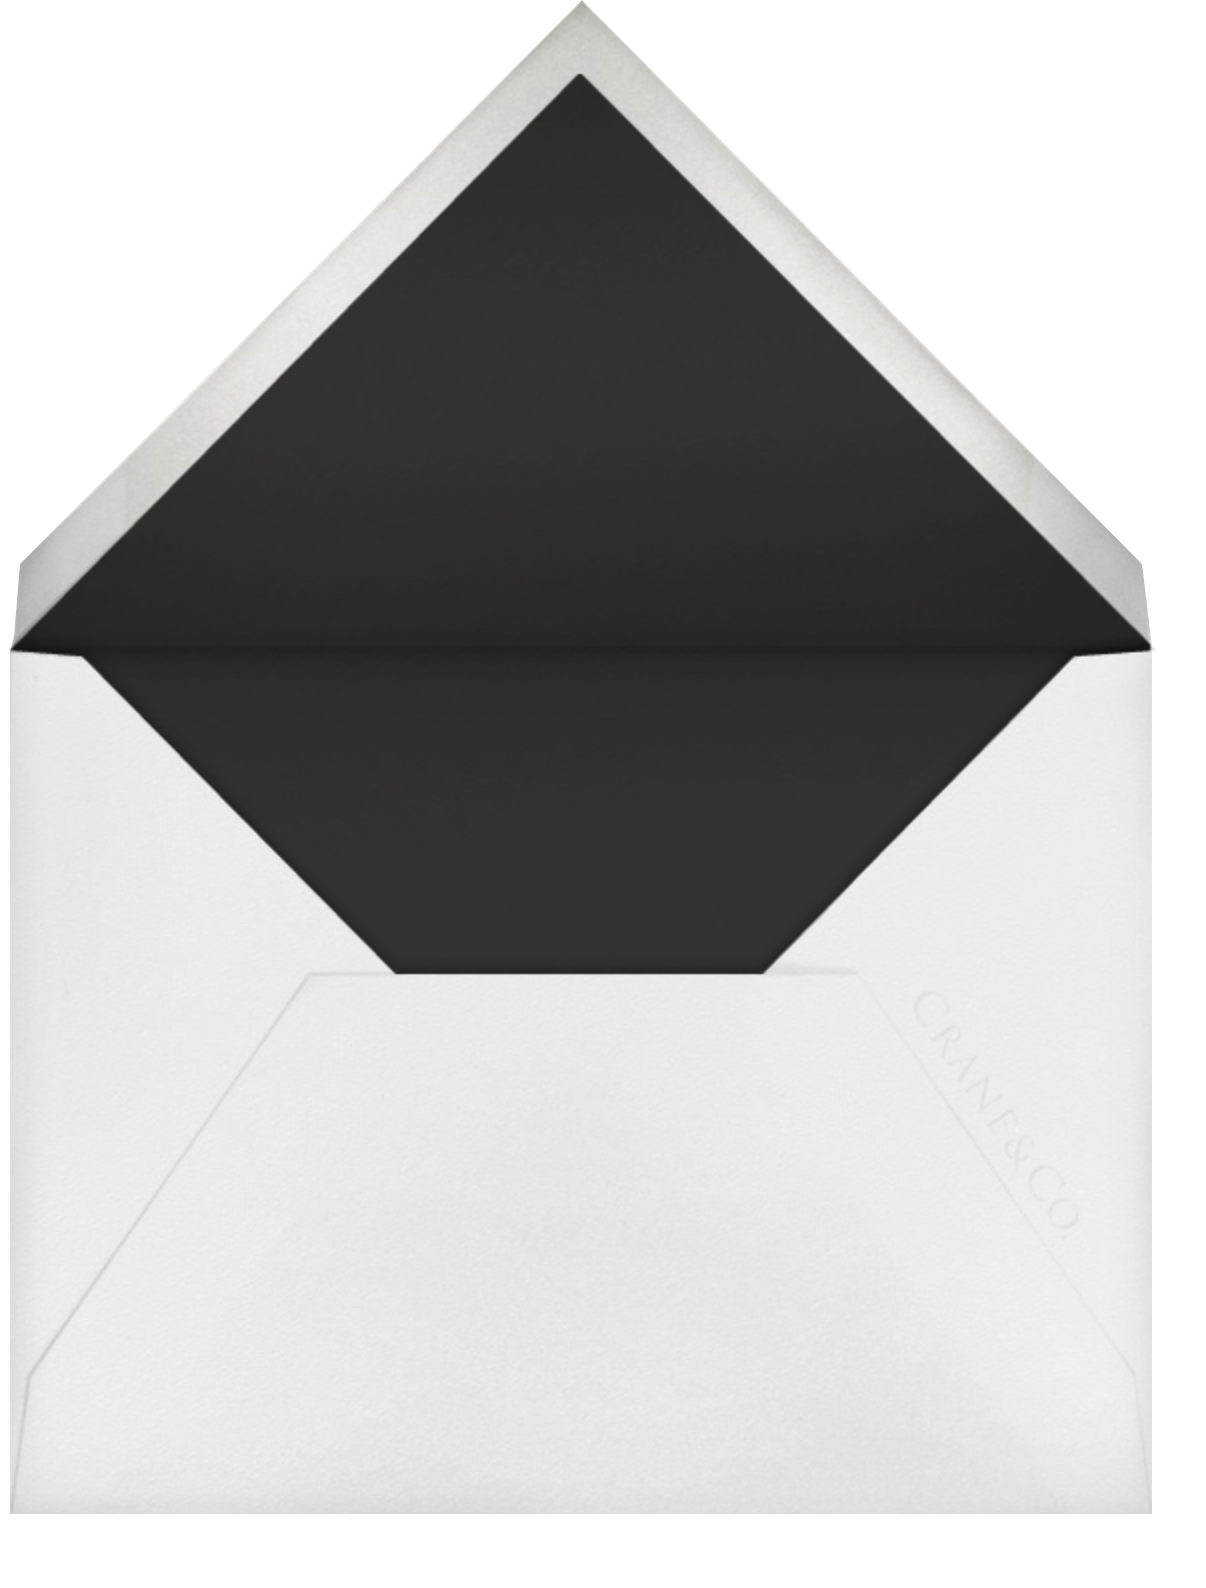 Strake (Stationery) - Black - Vera Wang - Personalized stationery - envelope back